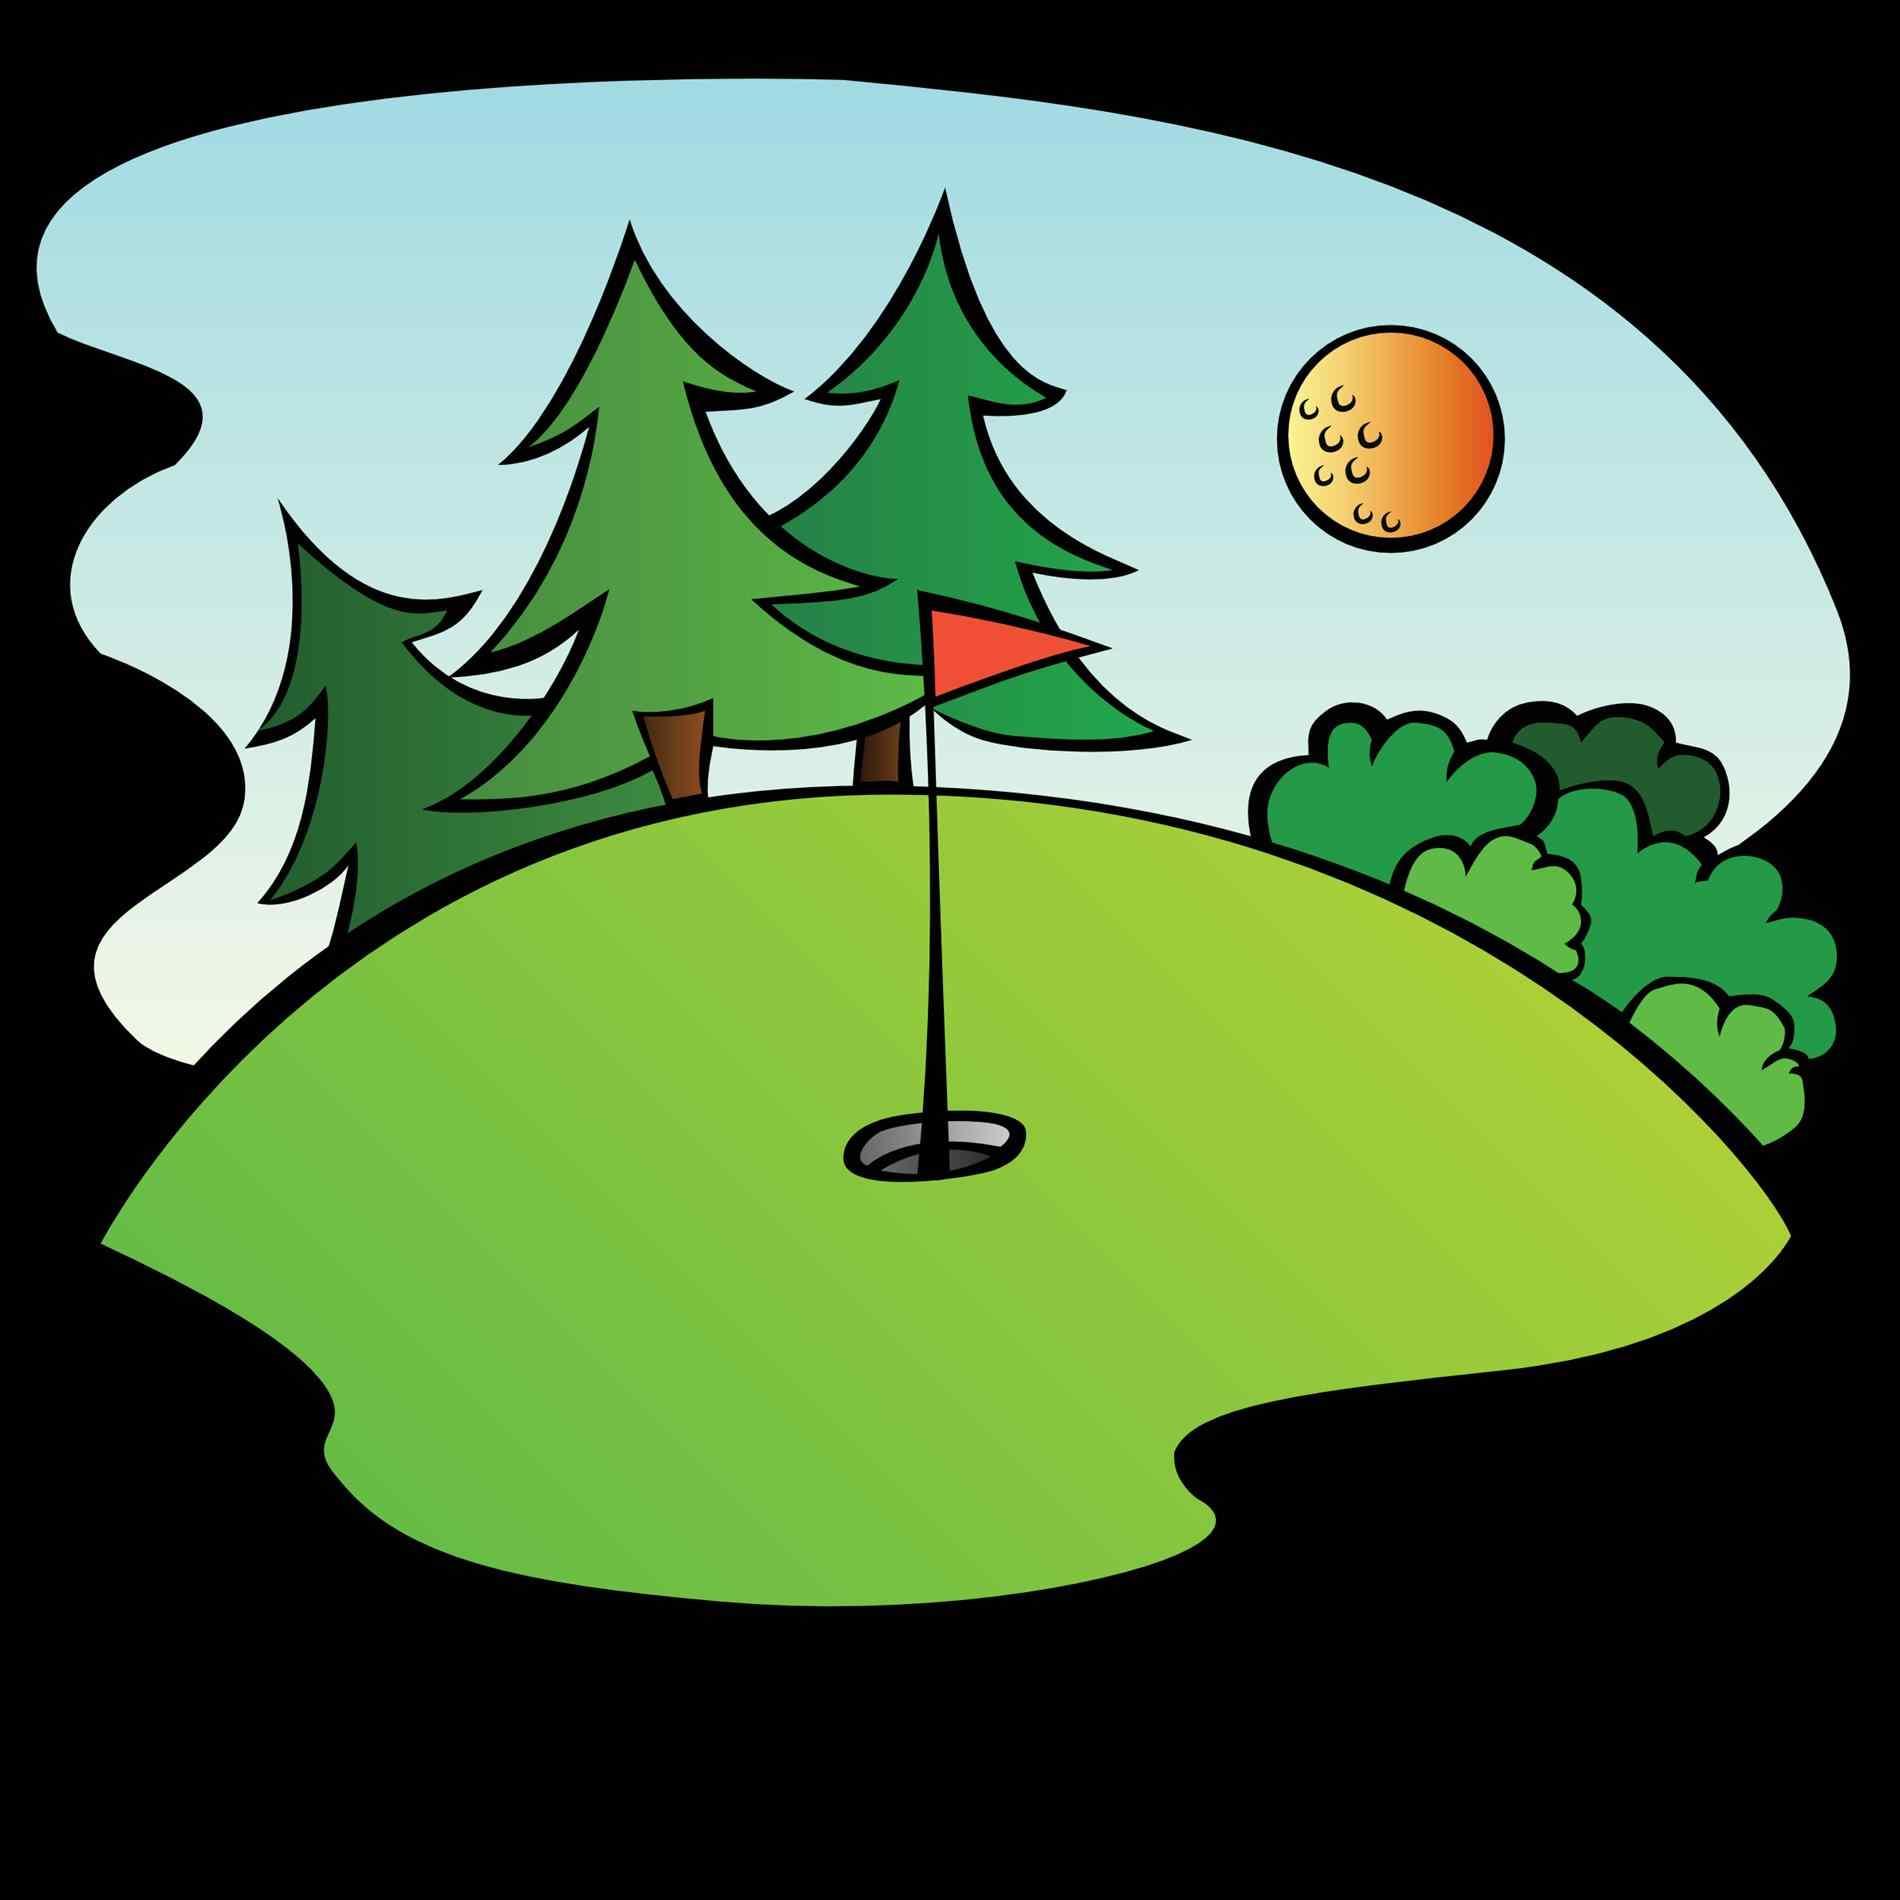 1900x1900 Golf Hole Clip Art Borisimage.club